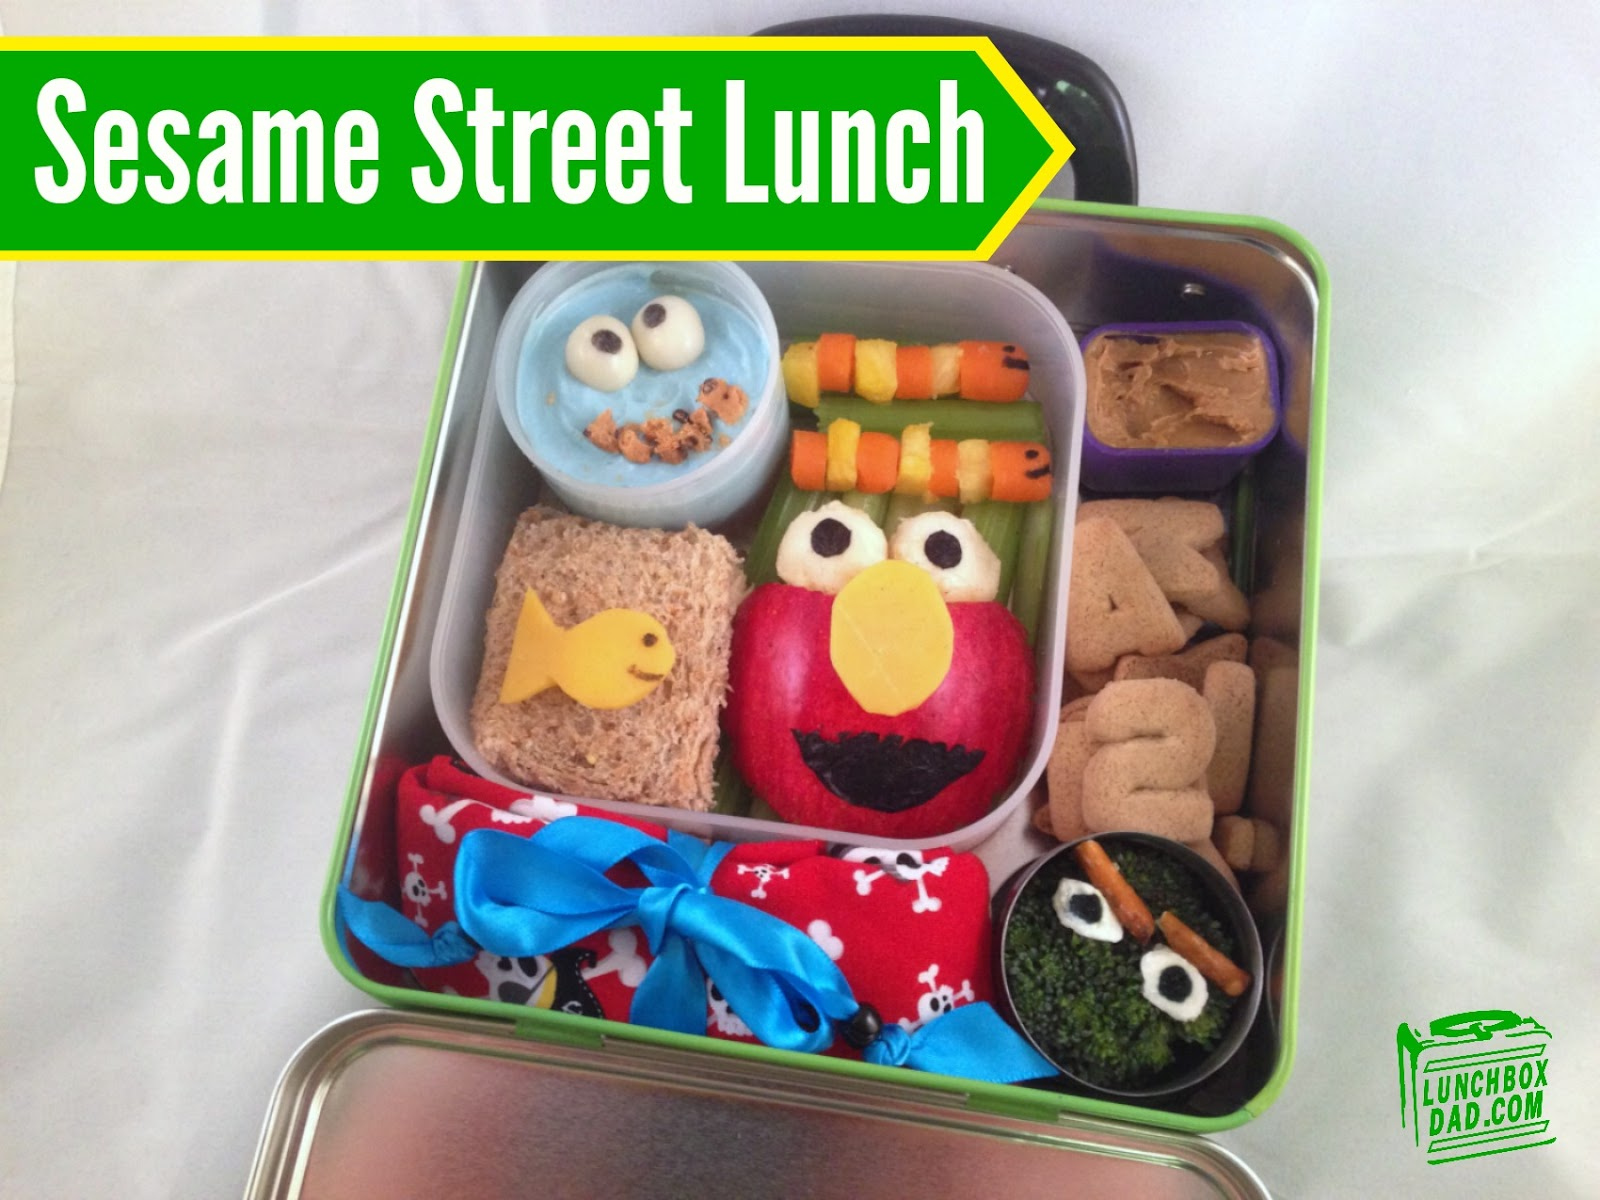 Sesame Street Bento Lunch With Elmo Oscar The Grouch The